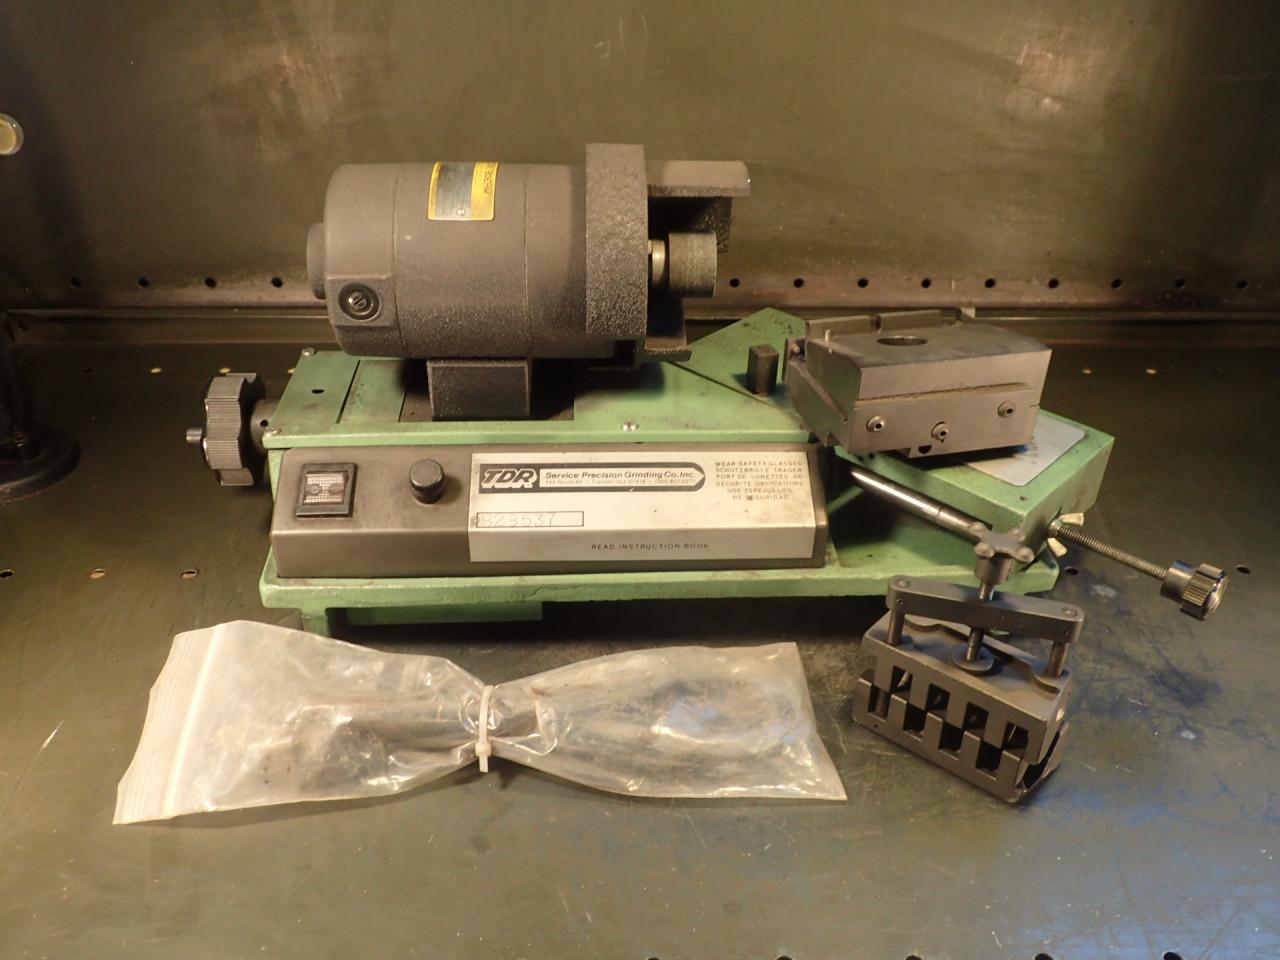 TDR SRD 82-R 1/4 HP 7800-RPM End MIll Drill Sharpener Grinder: 115V, Used Good